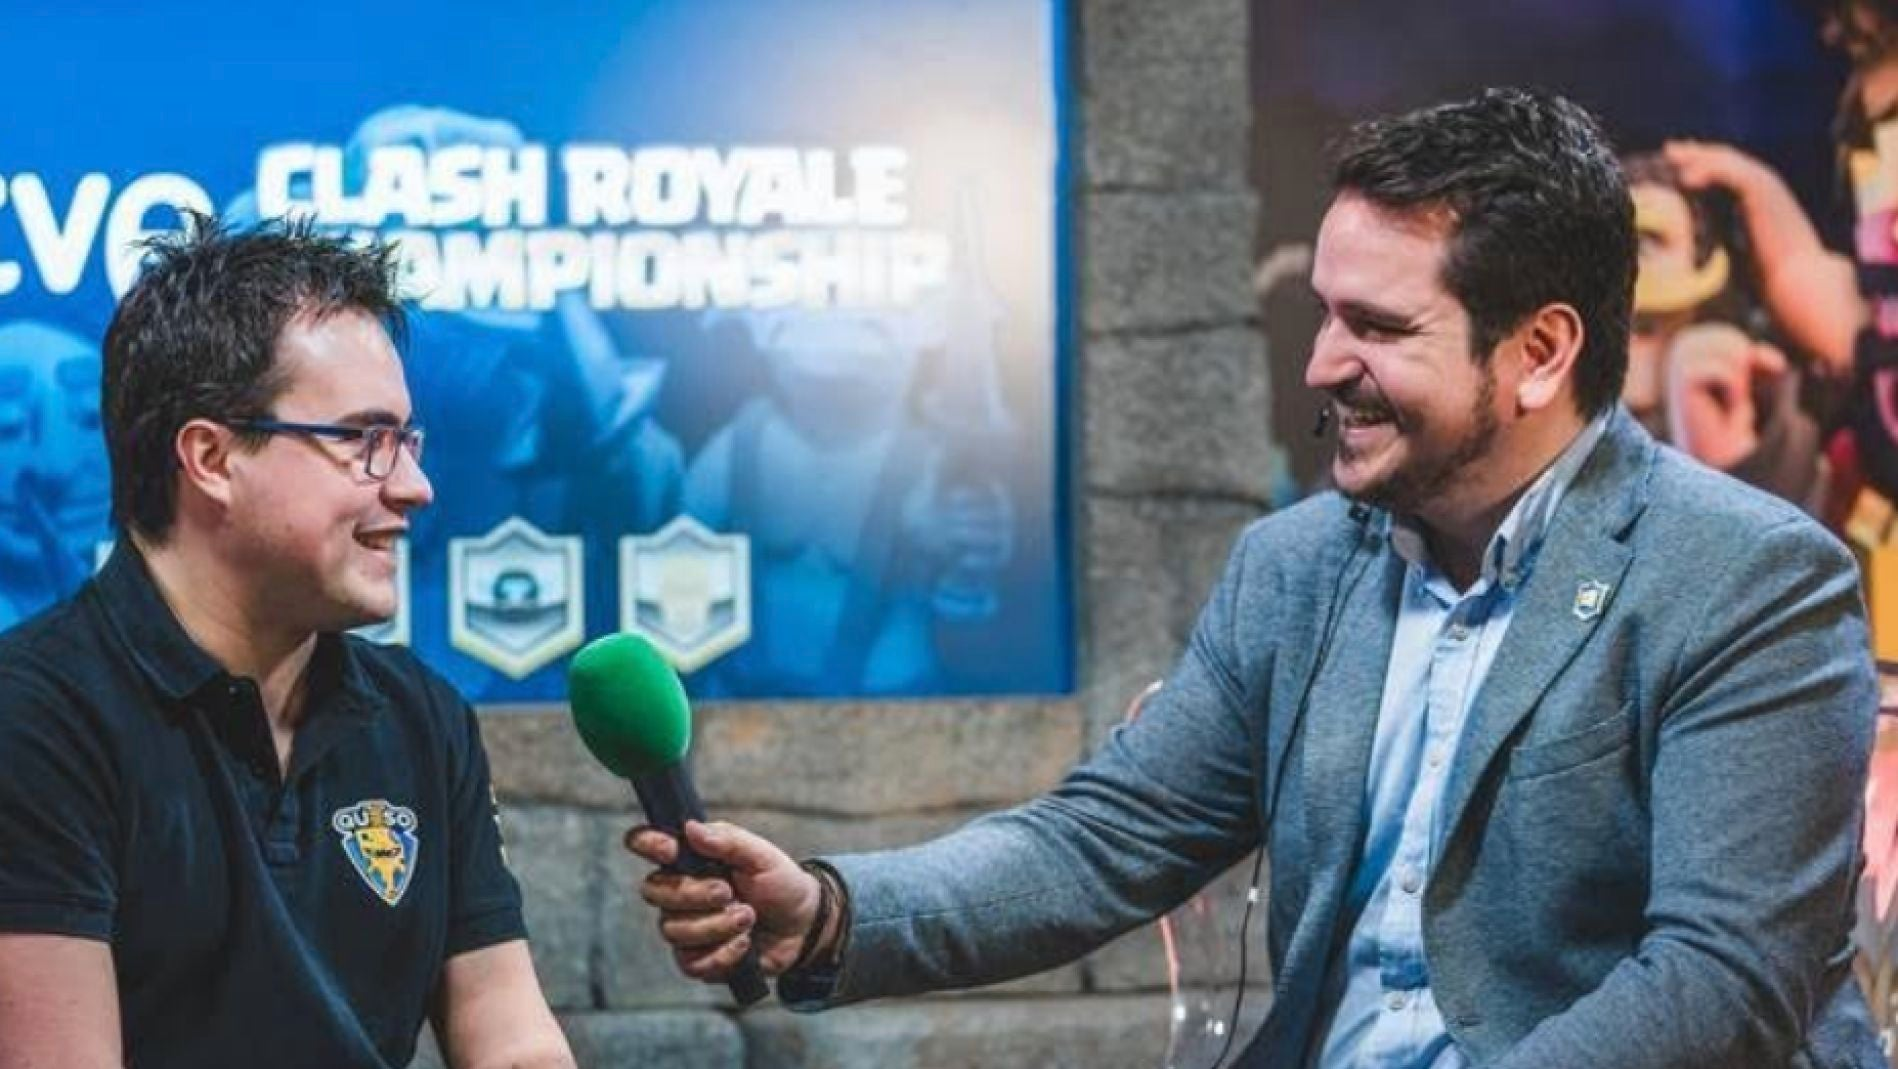 Charly Nighter entrevistando a Alvaro845